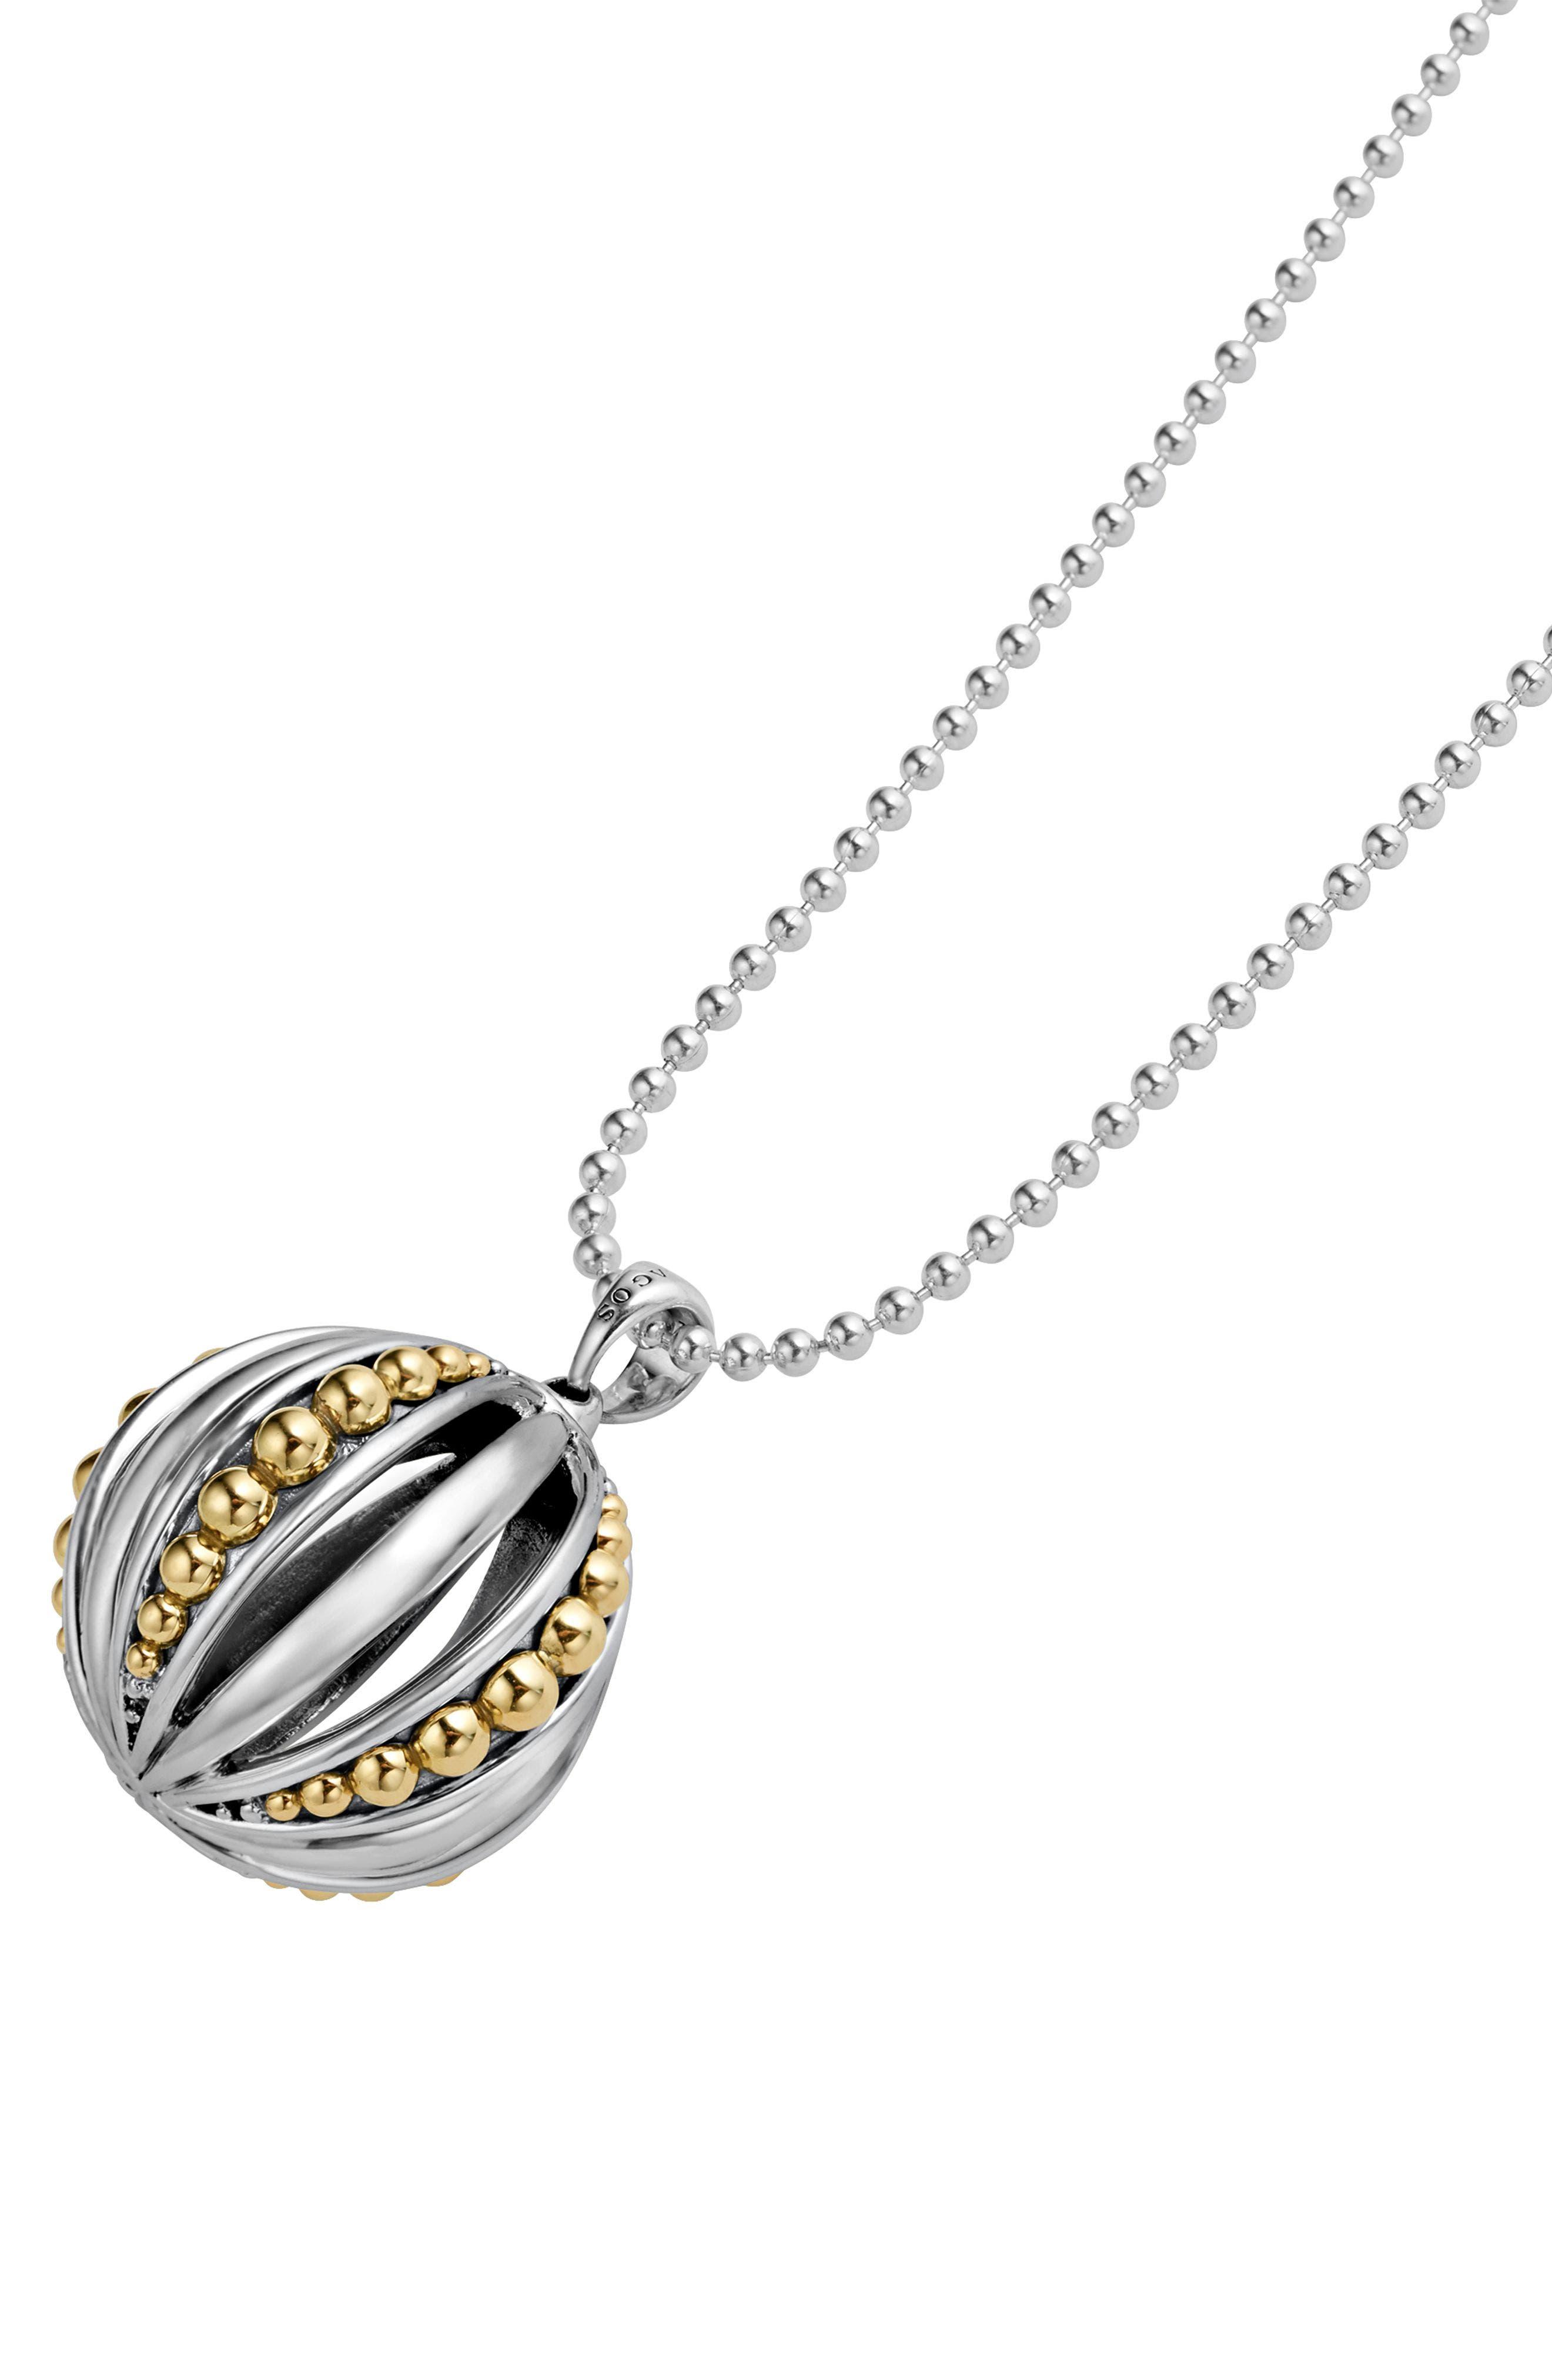 Caviar Talisman Beaded Cage Ball Pendant Necklace,                             Alternate thumbnail 3, color,                             SILVER/ 18K GOLD